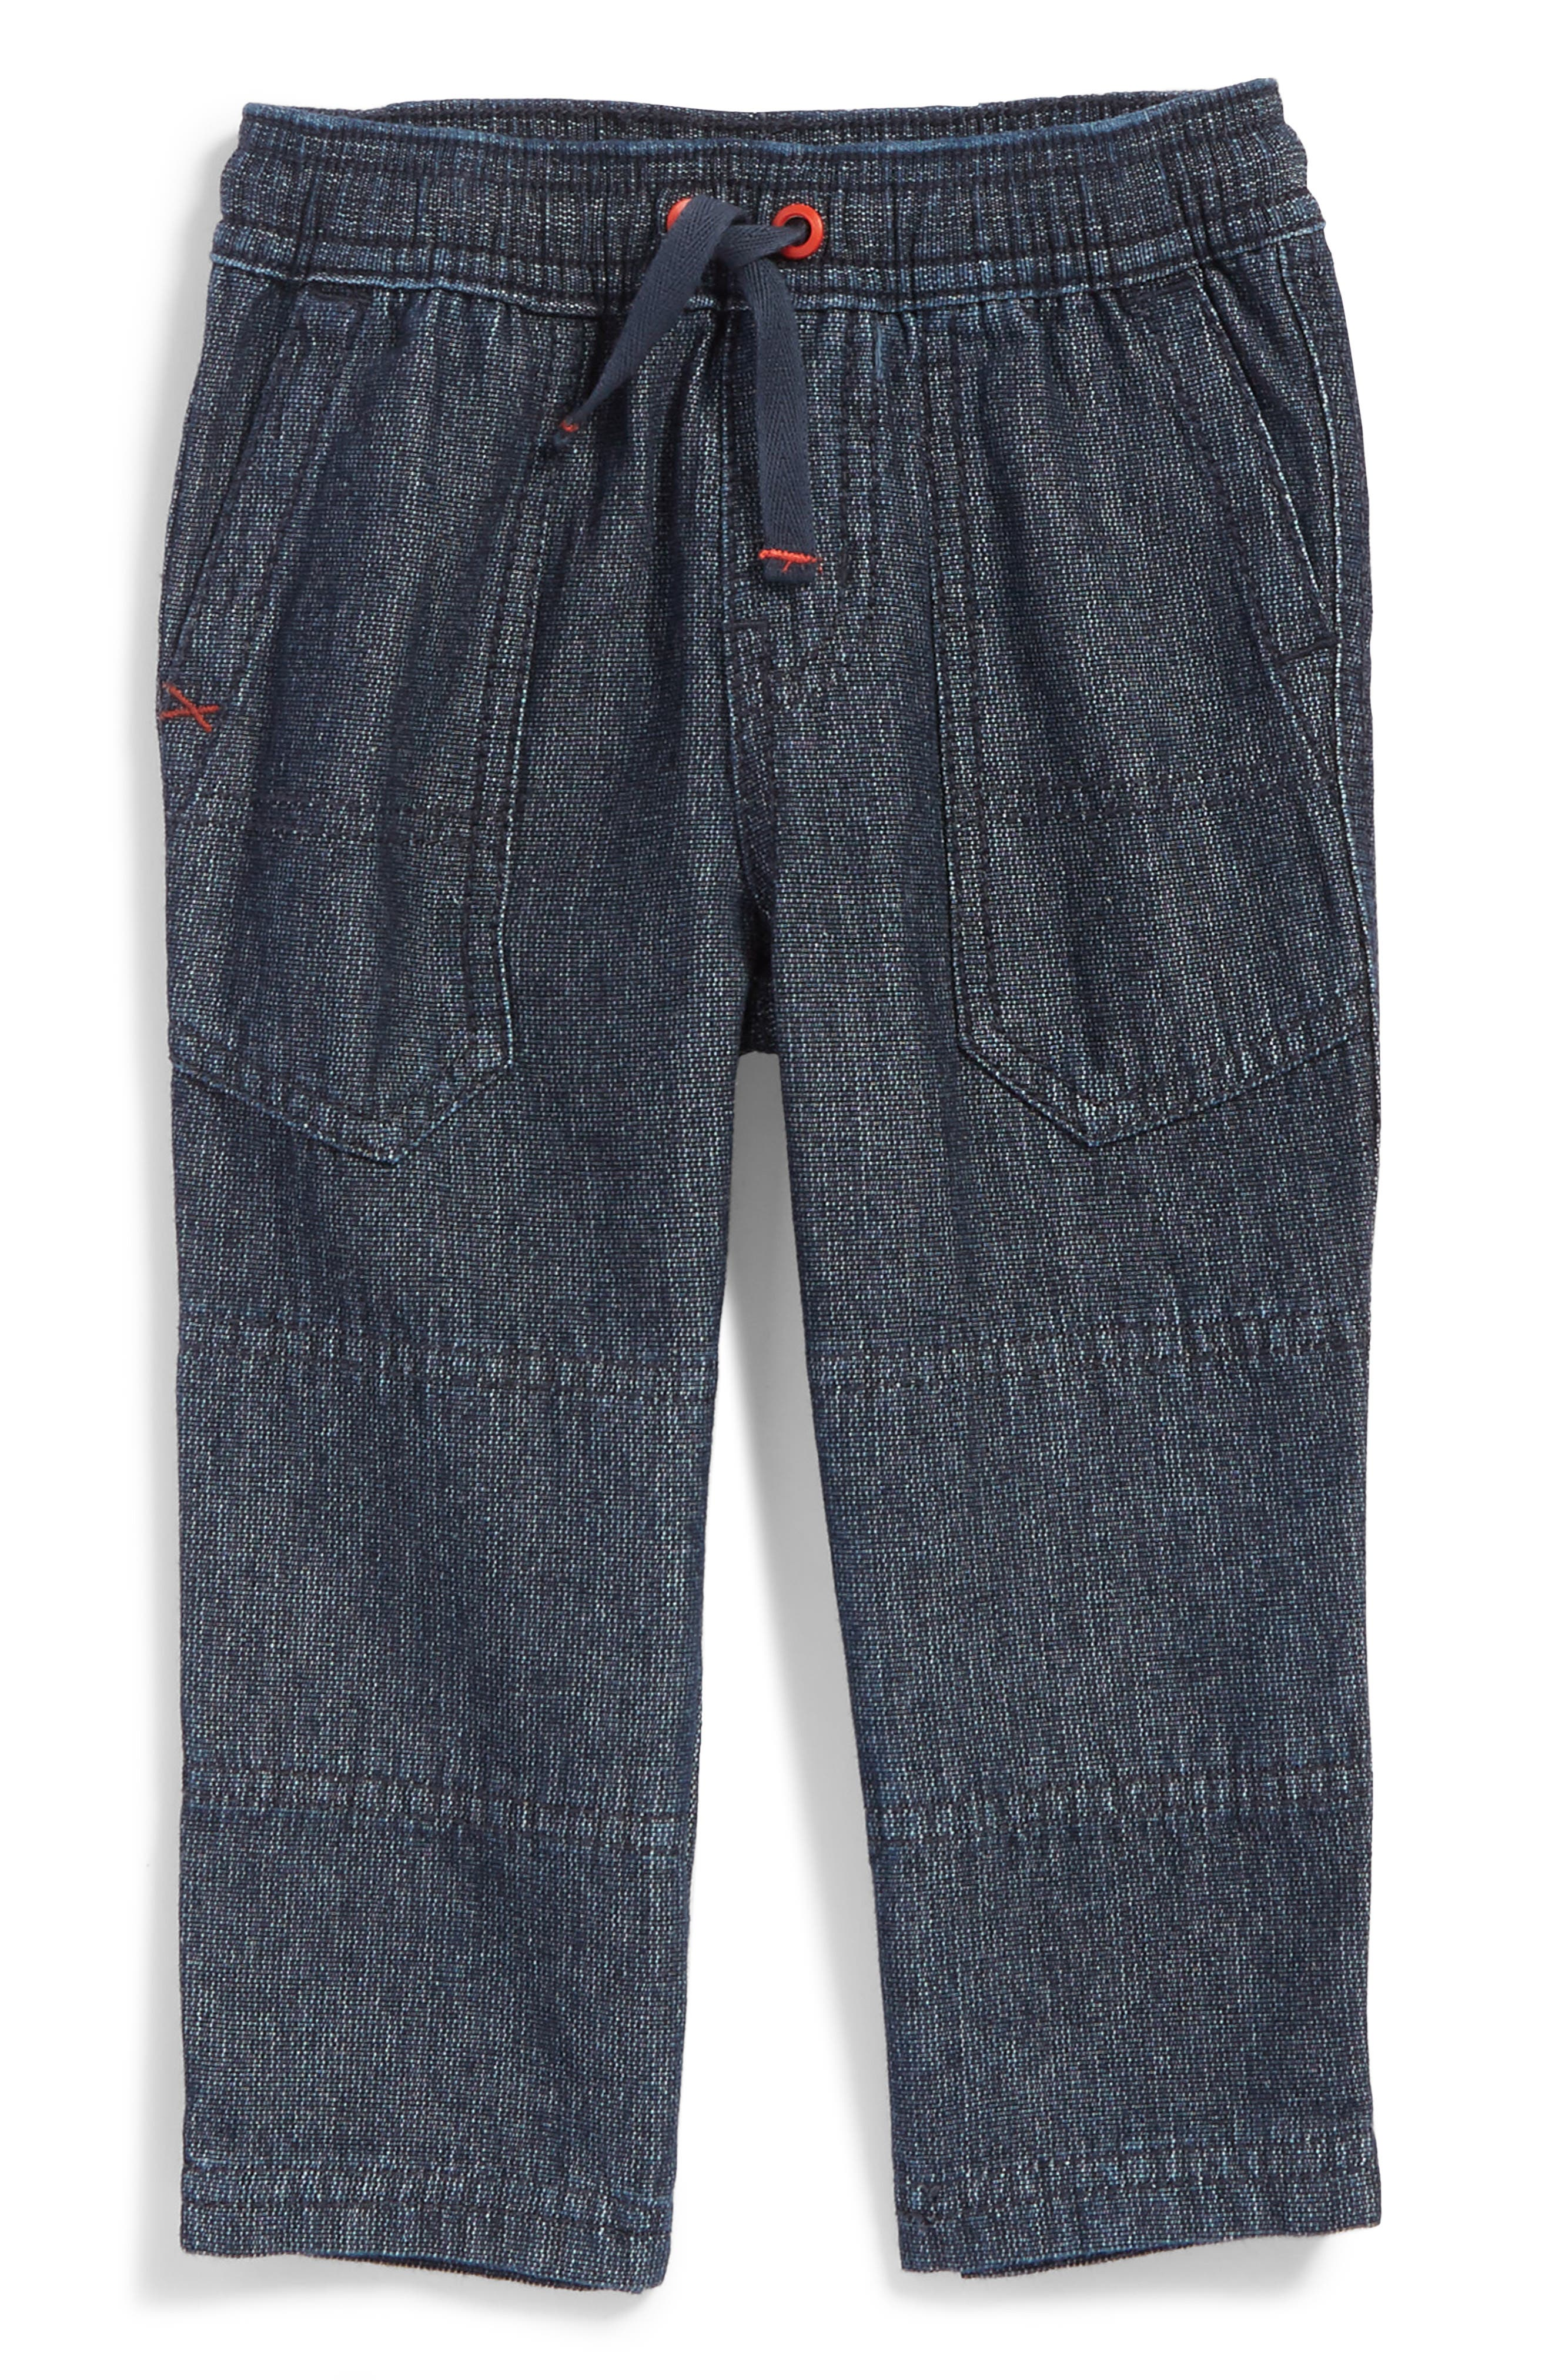 Canvas Explorer Pants,                         Main,                         color, Indigo Wash